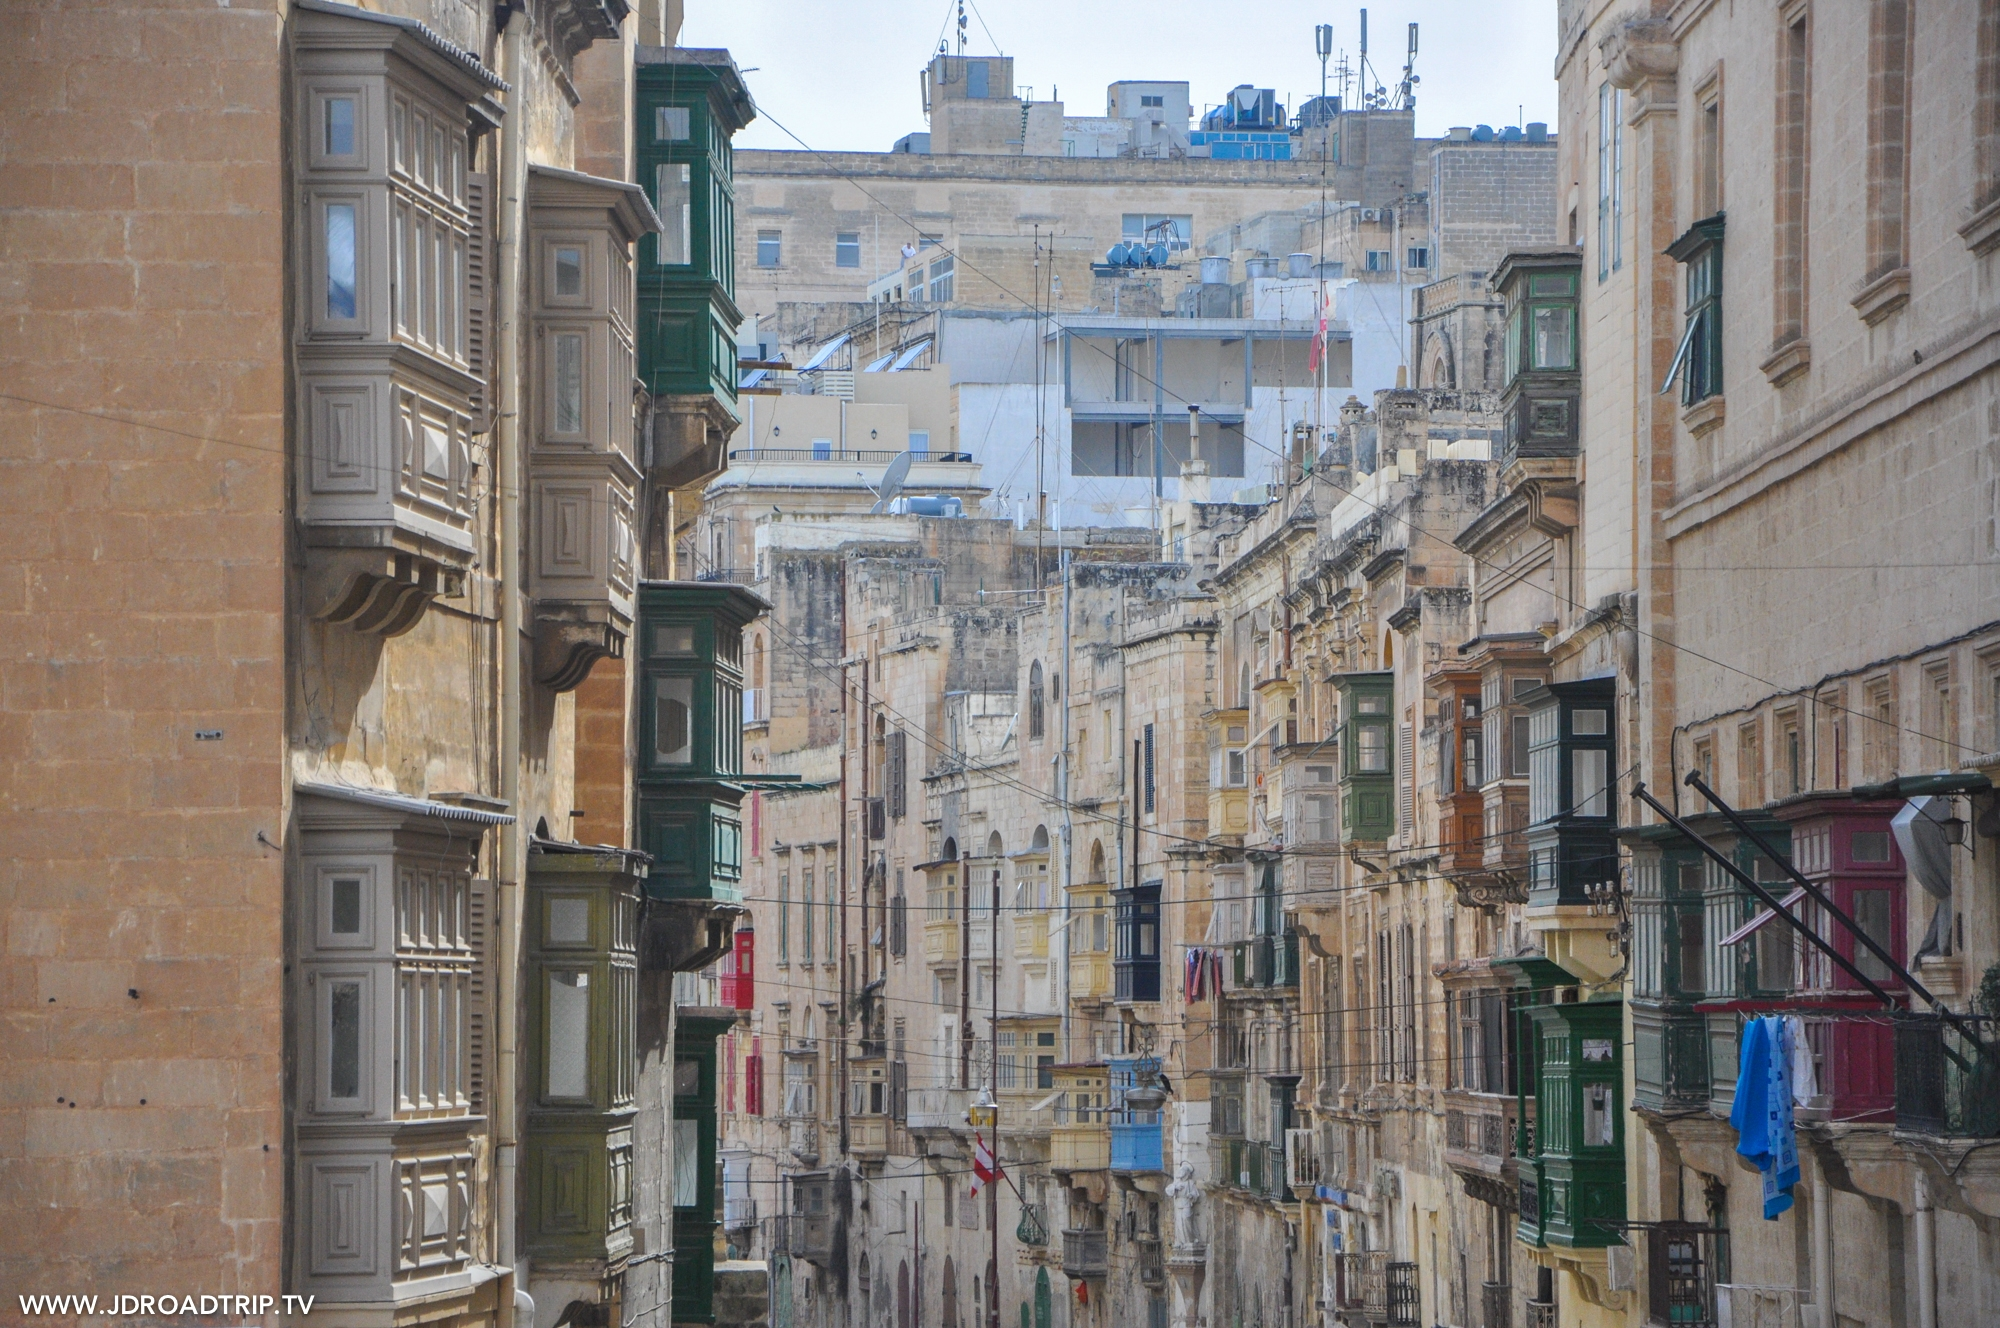 Visiter Malte en 4 jours - La Valette